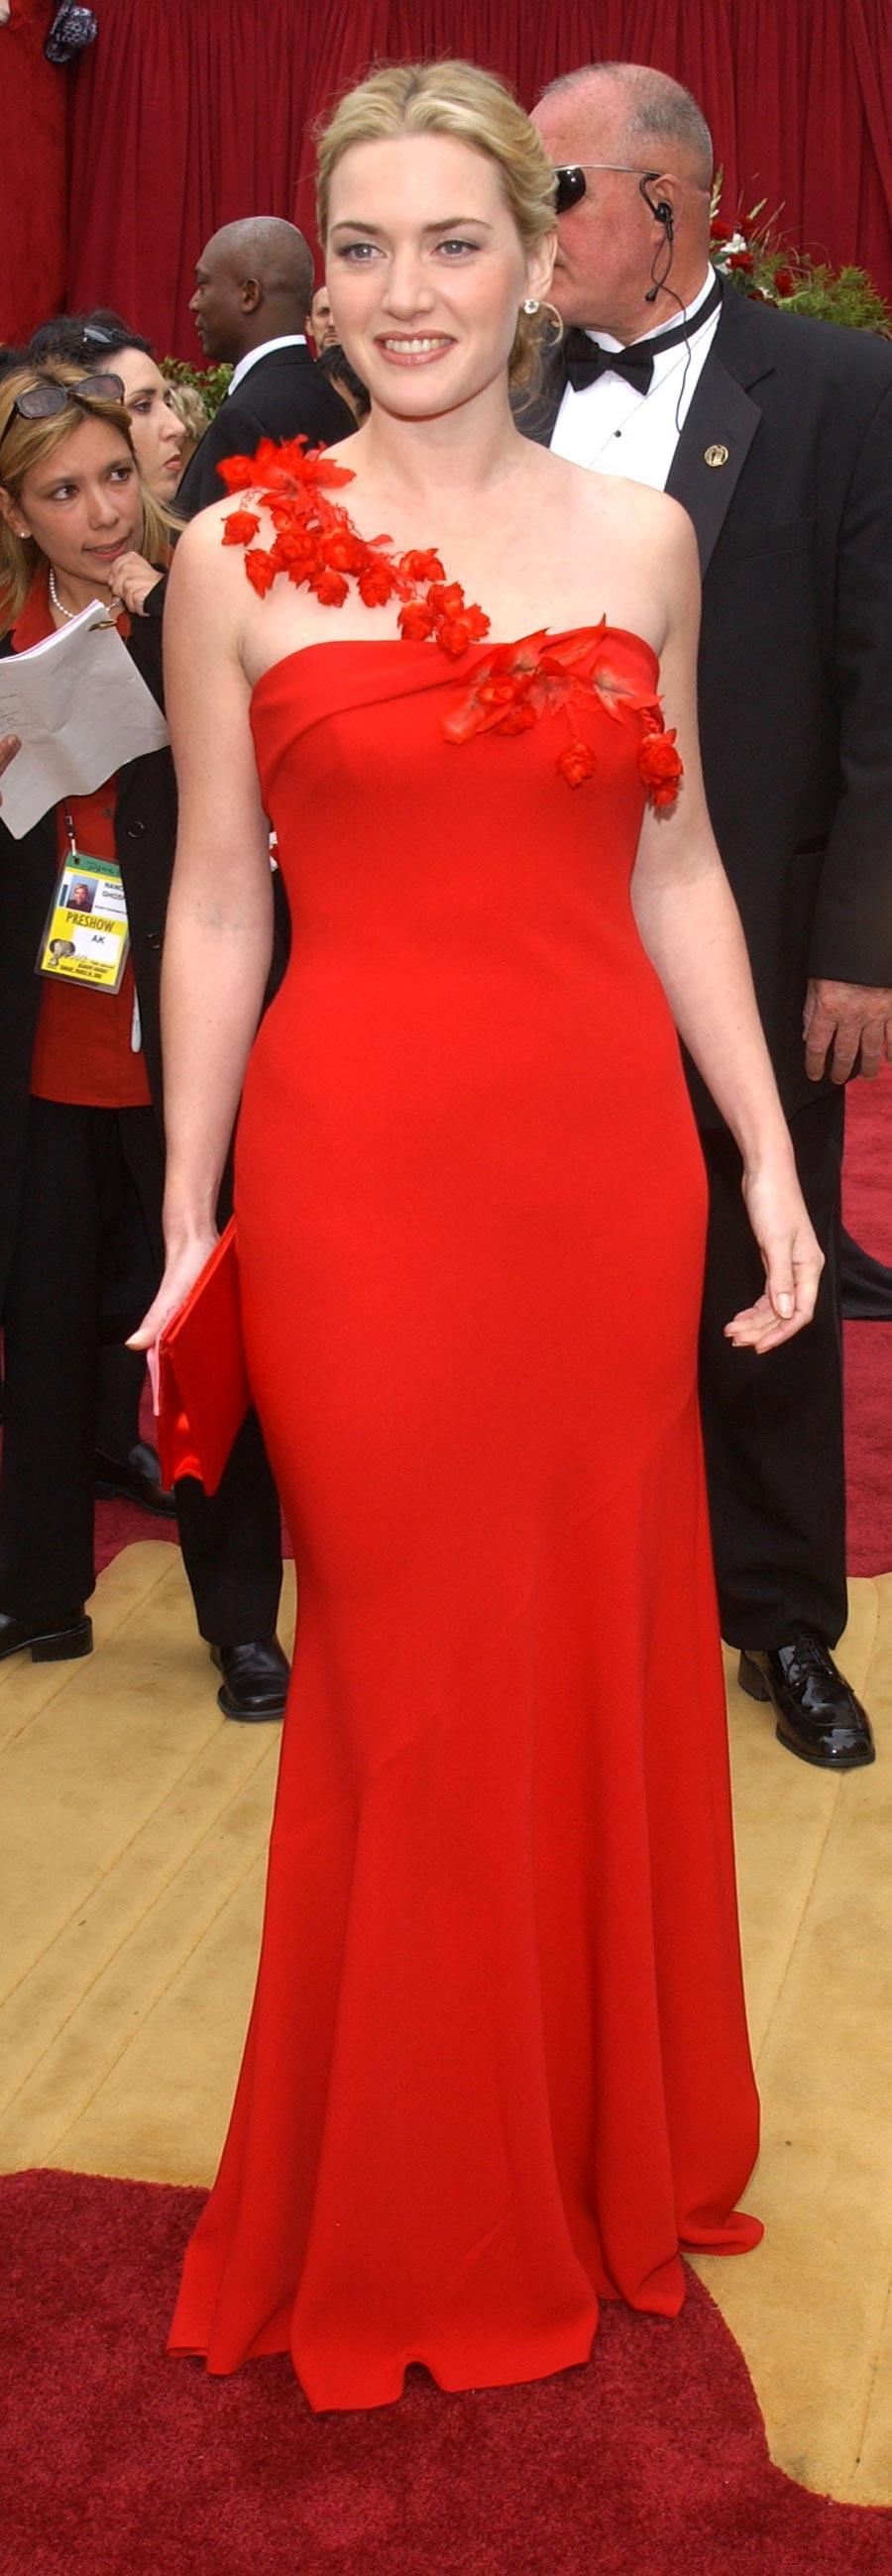 Kate Winslet - Ben de Lisi - 2002 (Foto: Getty Images)